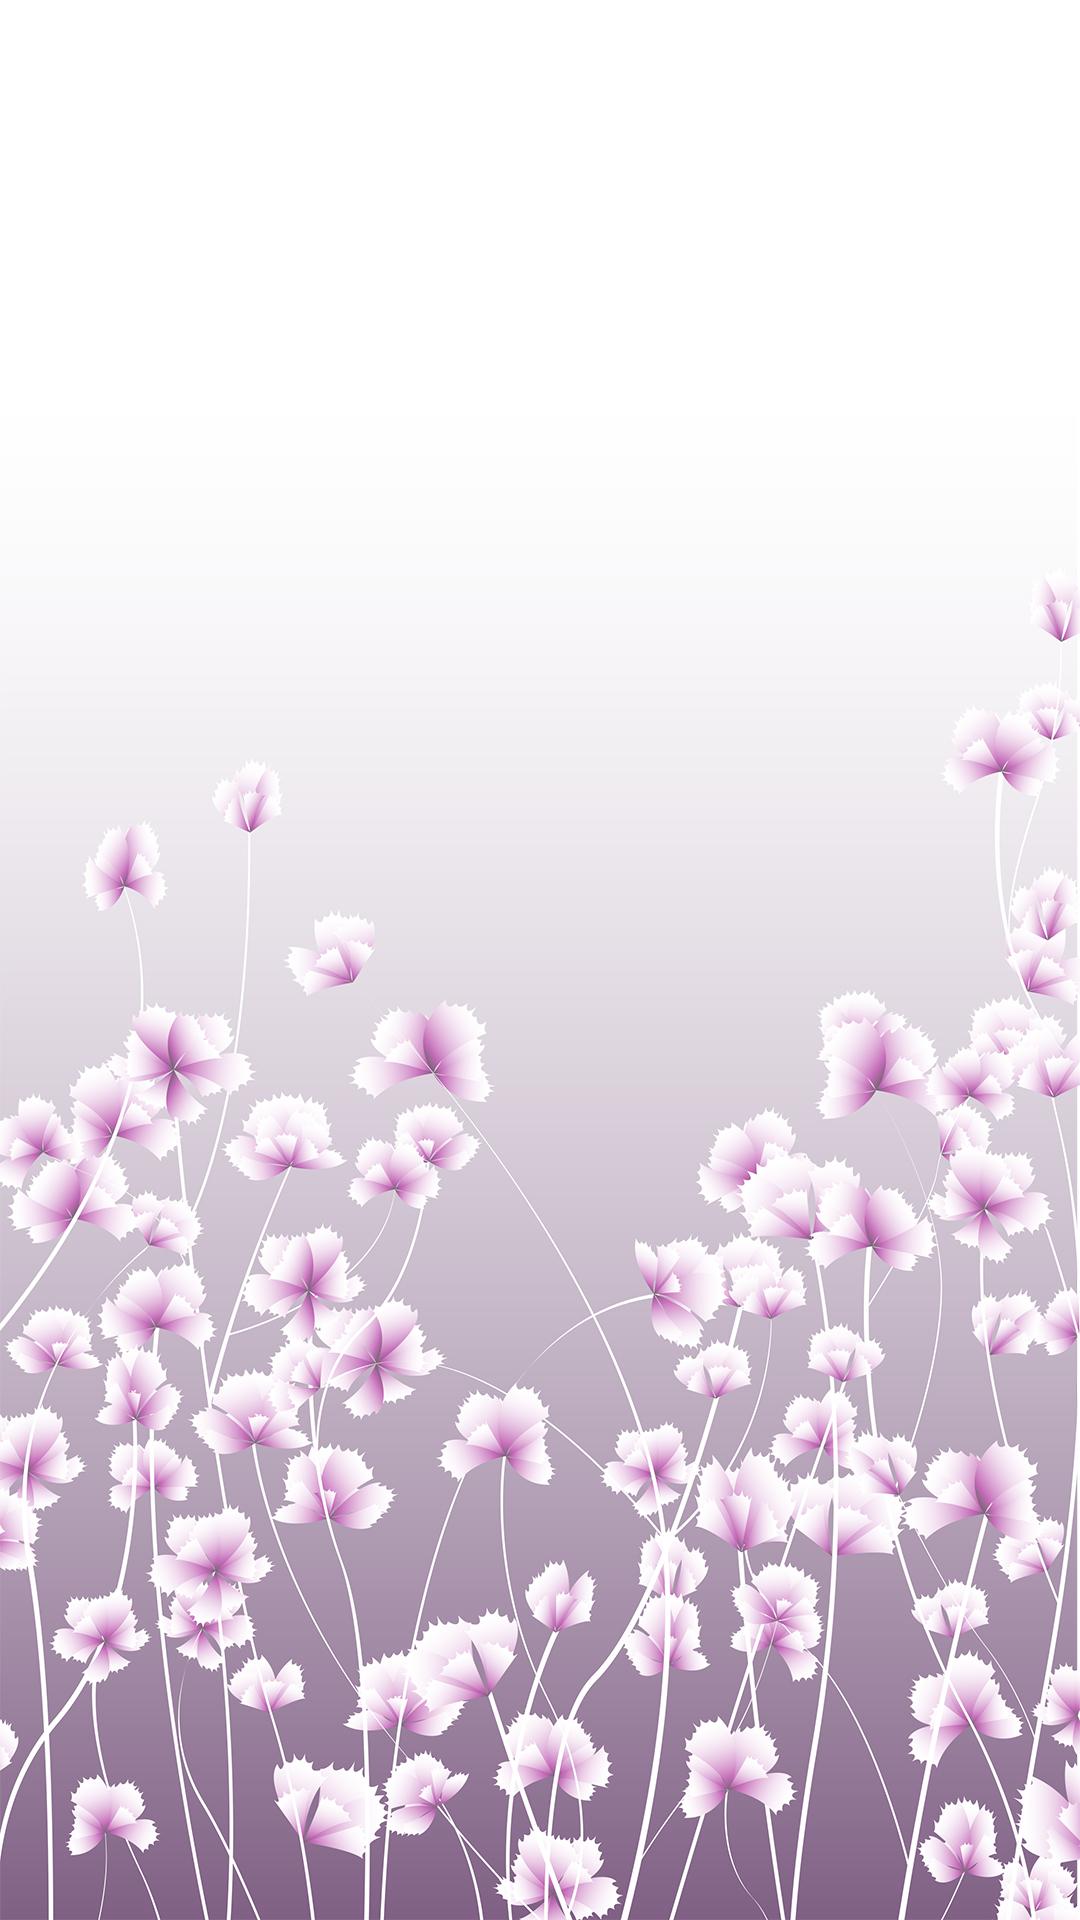 white flowers border h5 purple gradient background